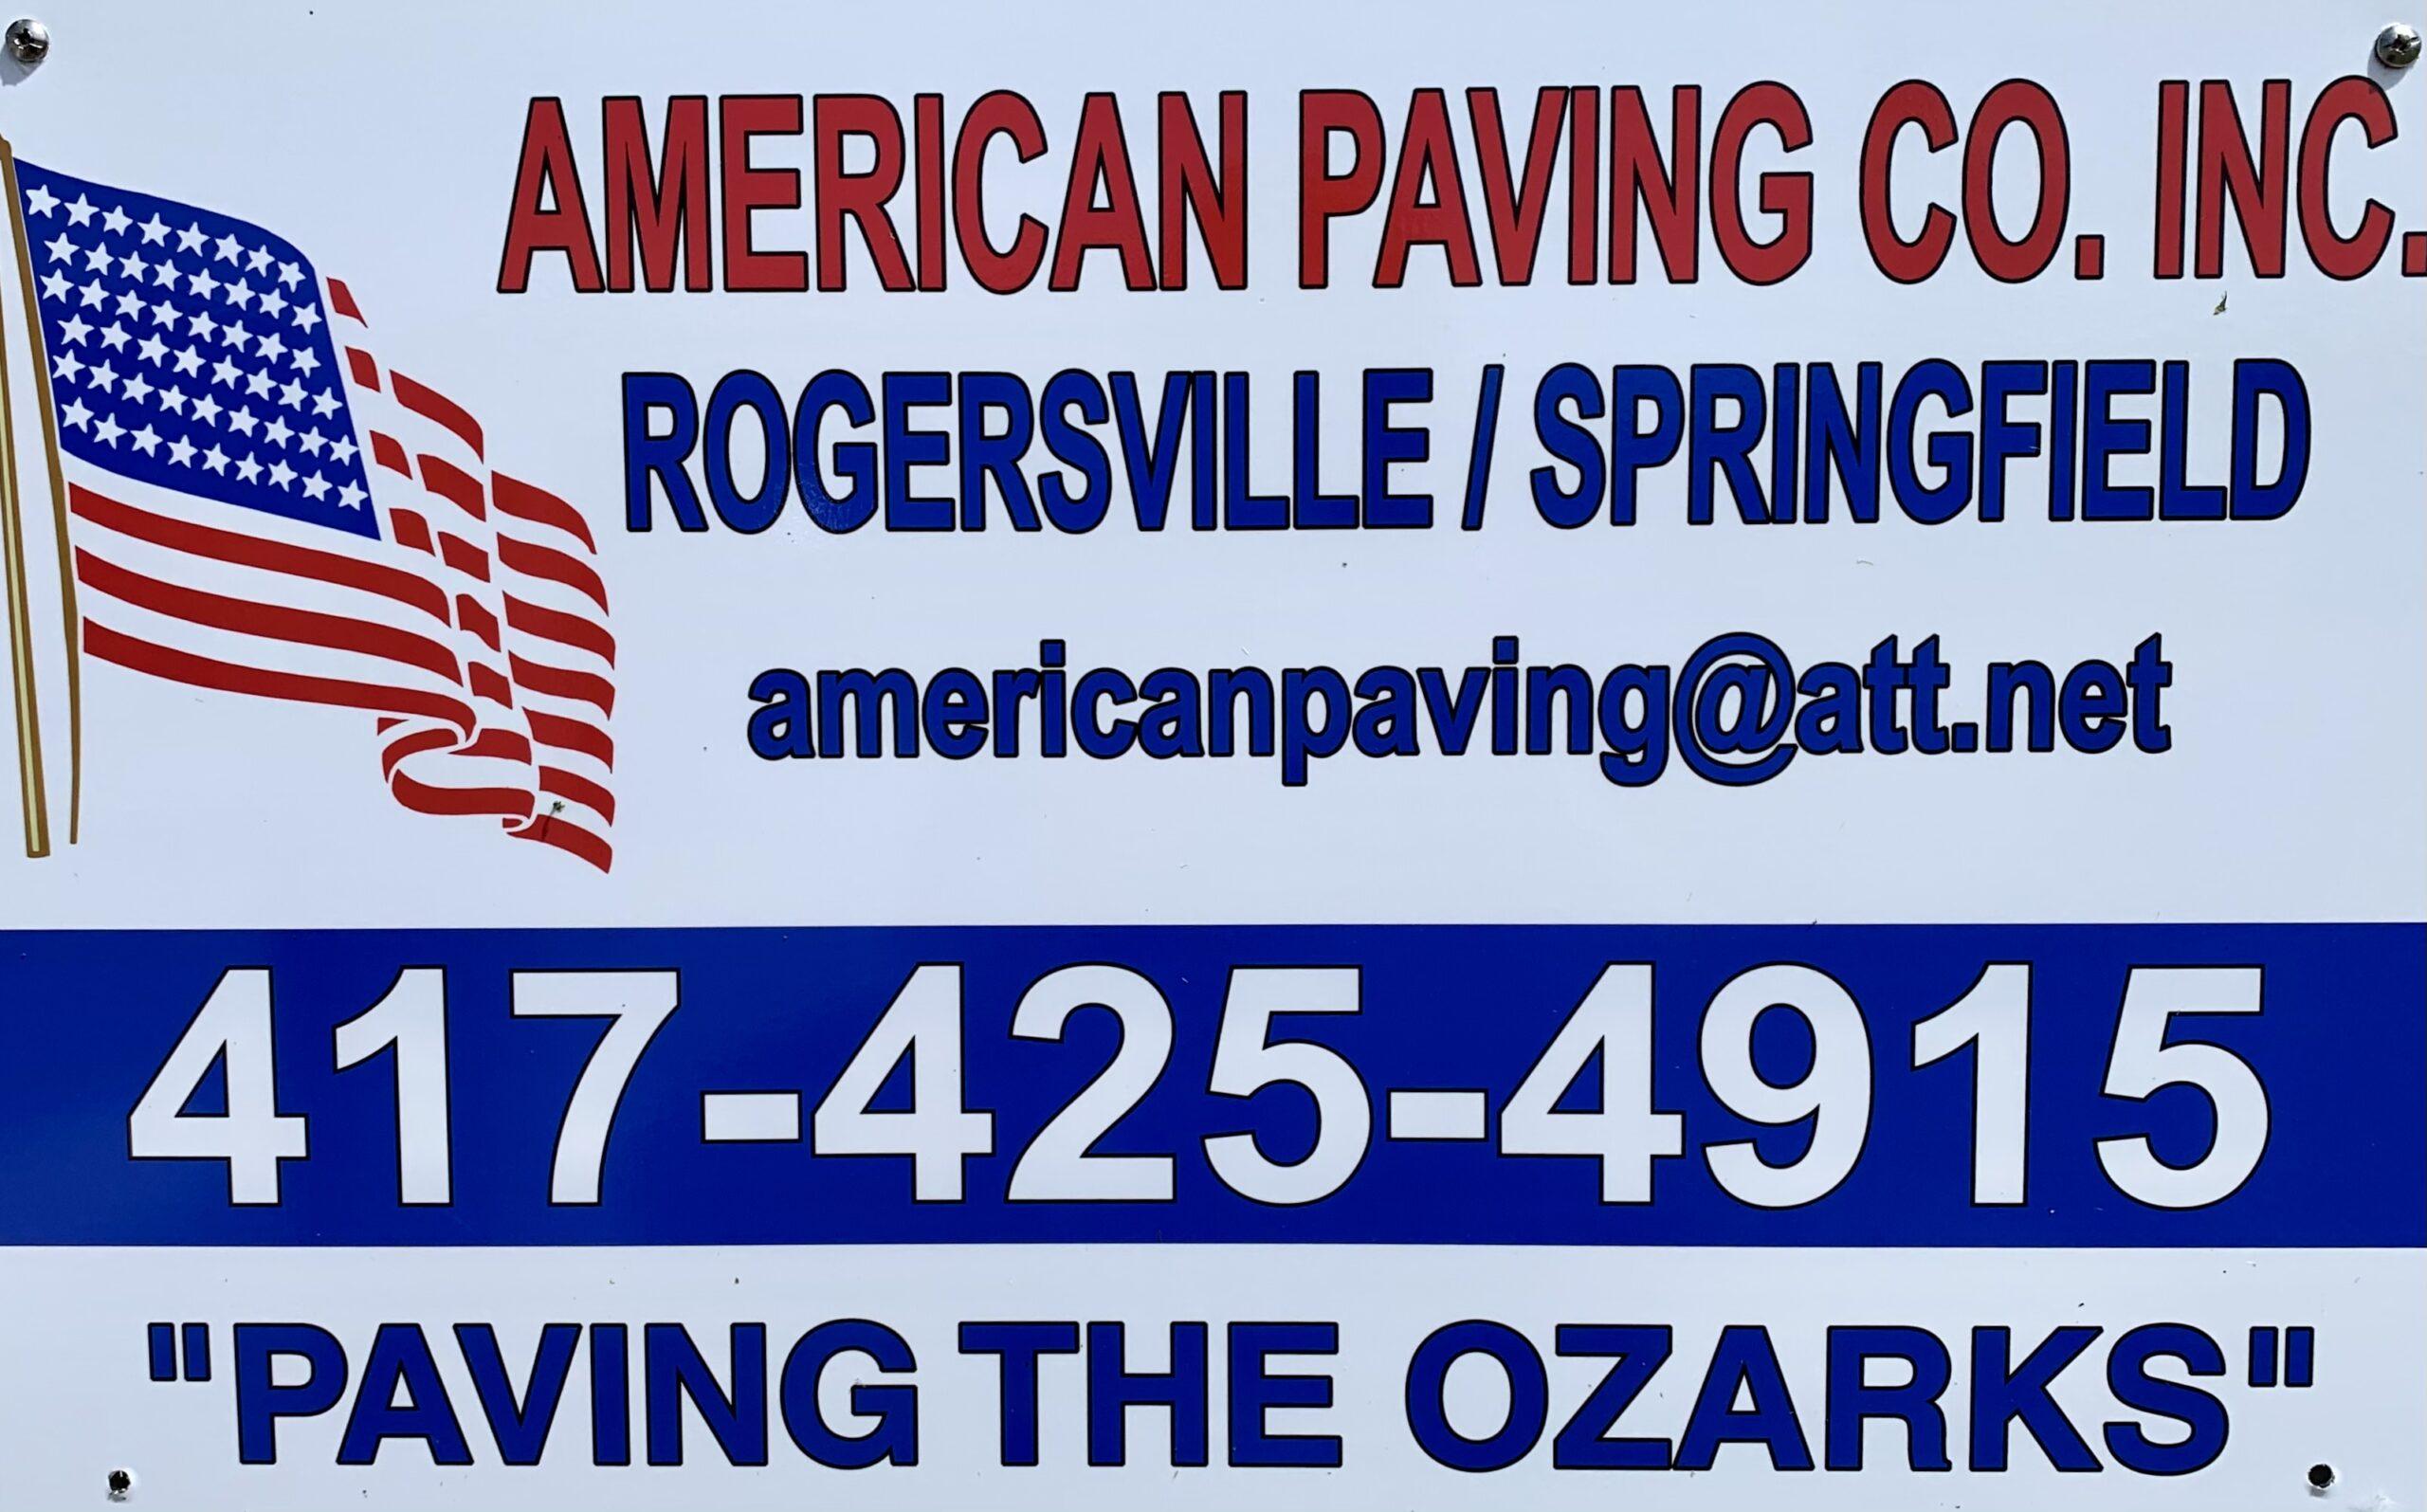 American Paving Co., Inc.